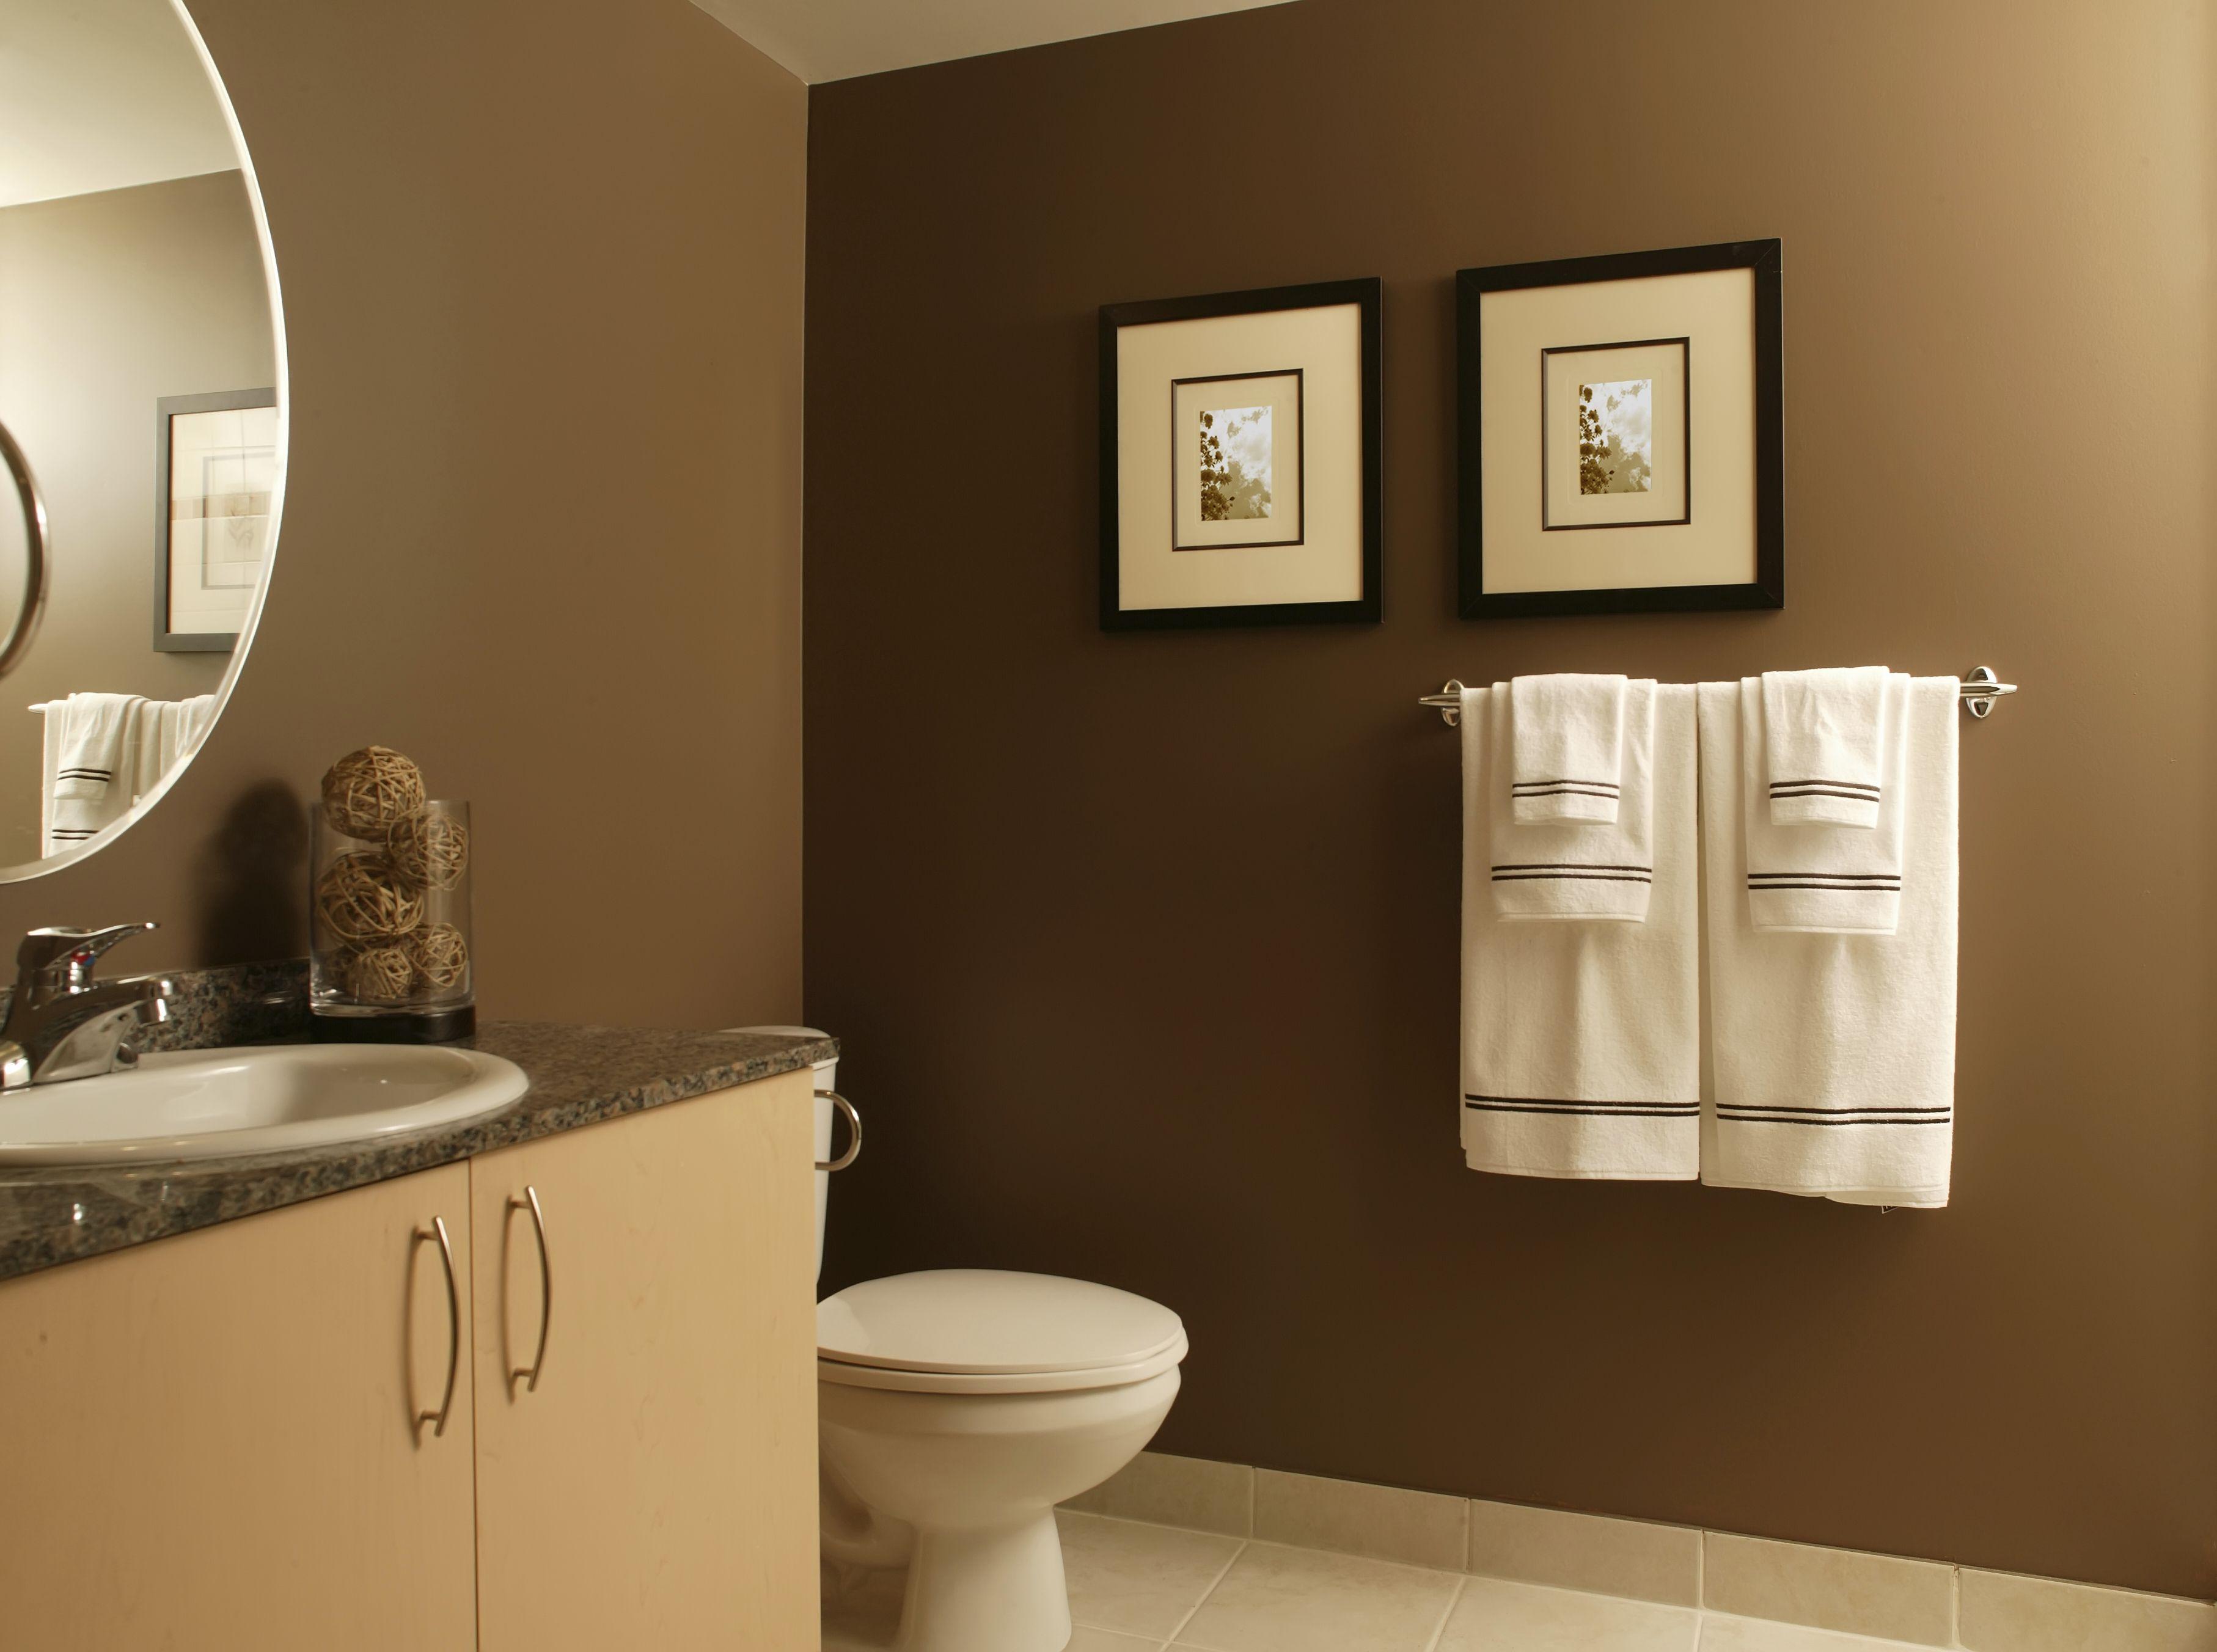 Beach Bathroom Color Ideas Part - 26: Creative Ideas For Bathroom Accent Walls - Designer Mag